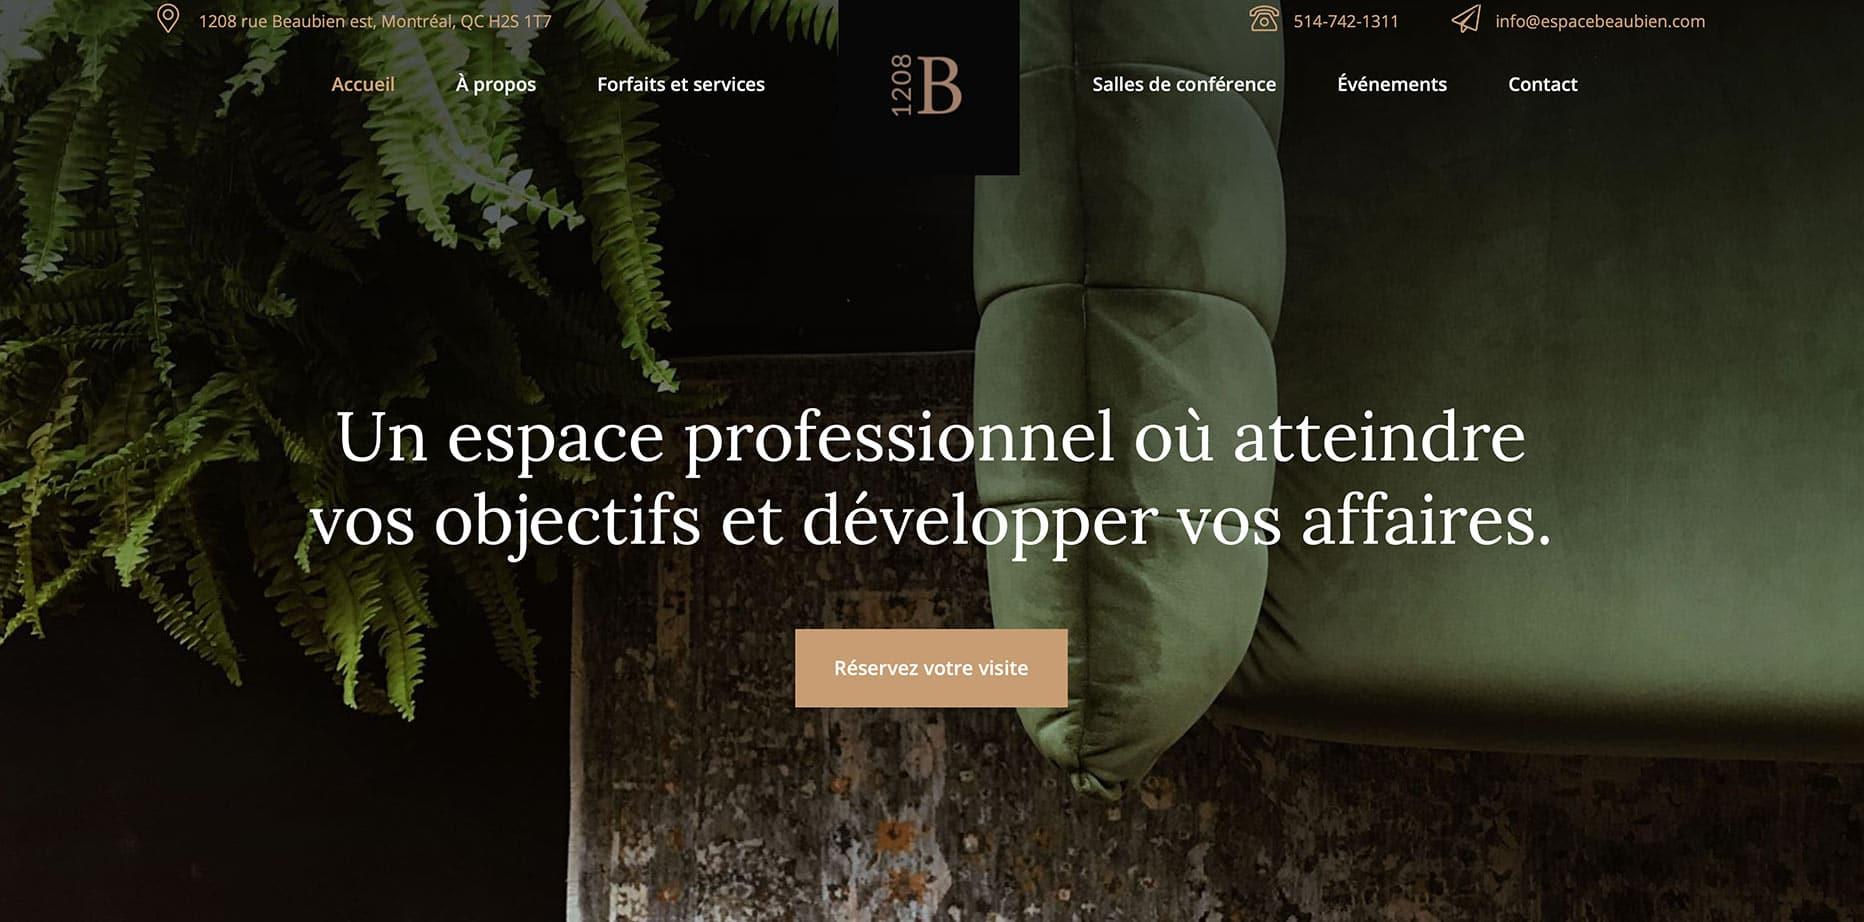 espace-beaubien-1